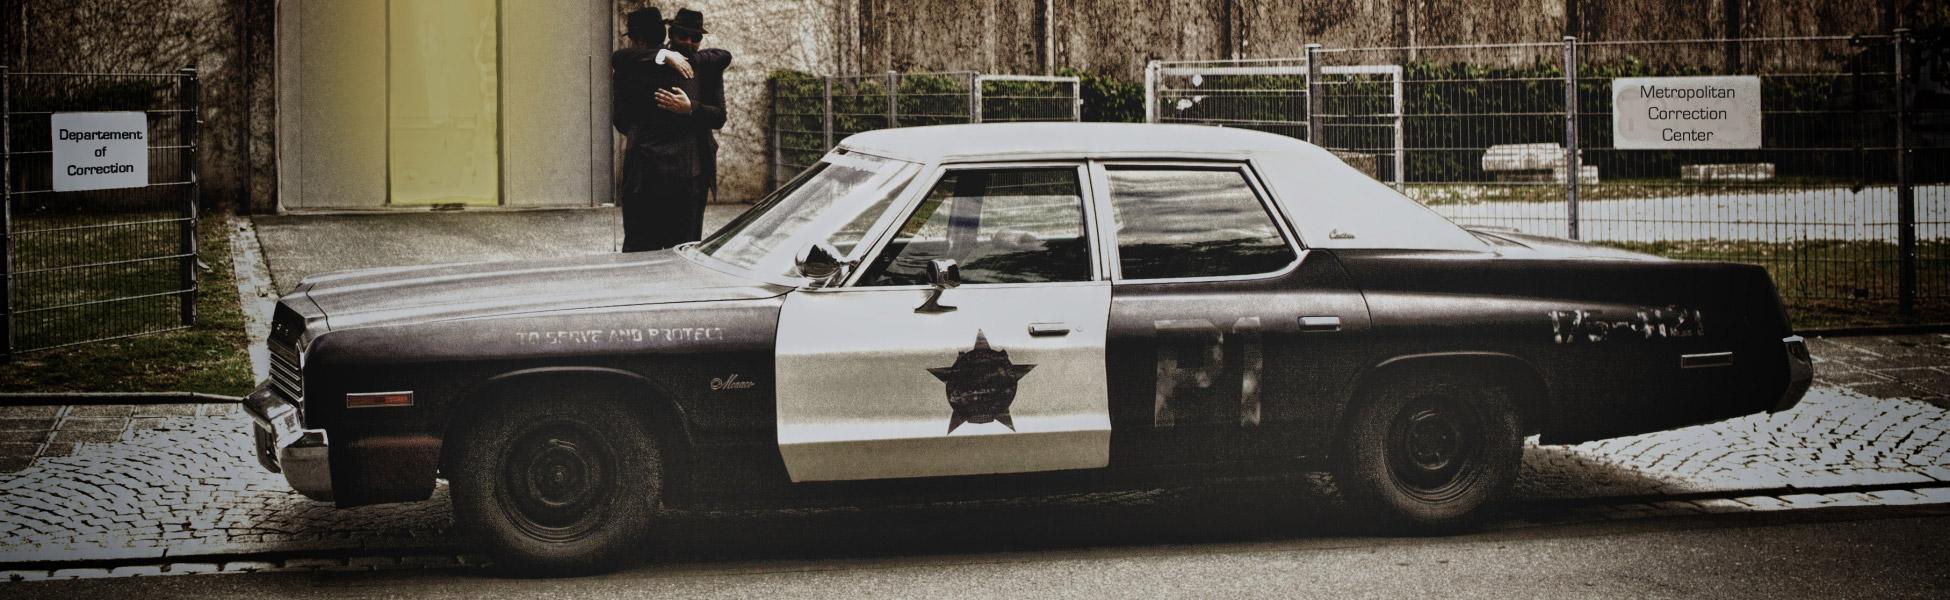 bluesmobile und us police cars mieten. Black Bedroom Furniture Sets. Home Design Ideas